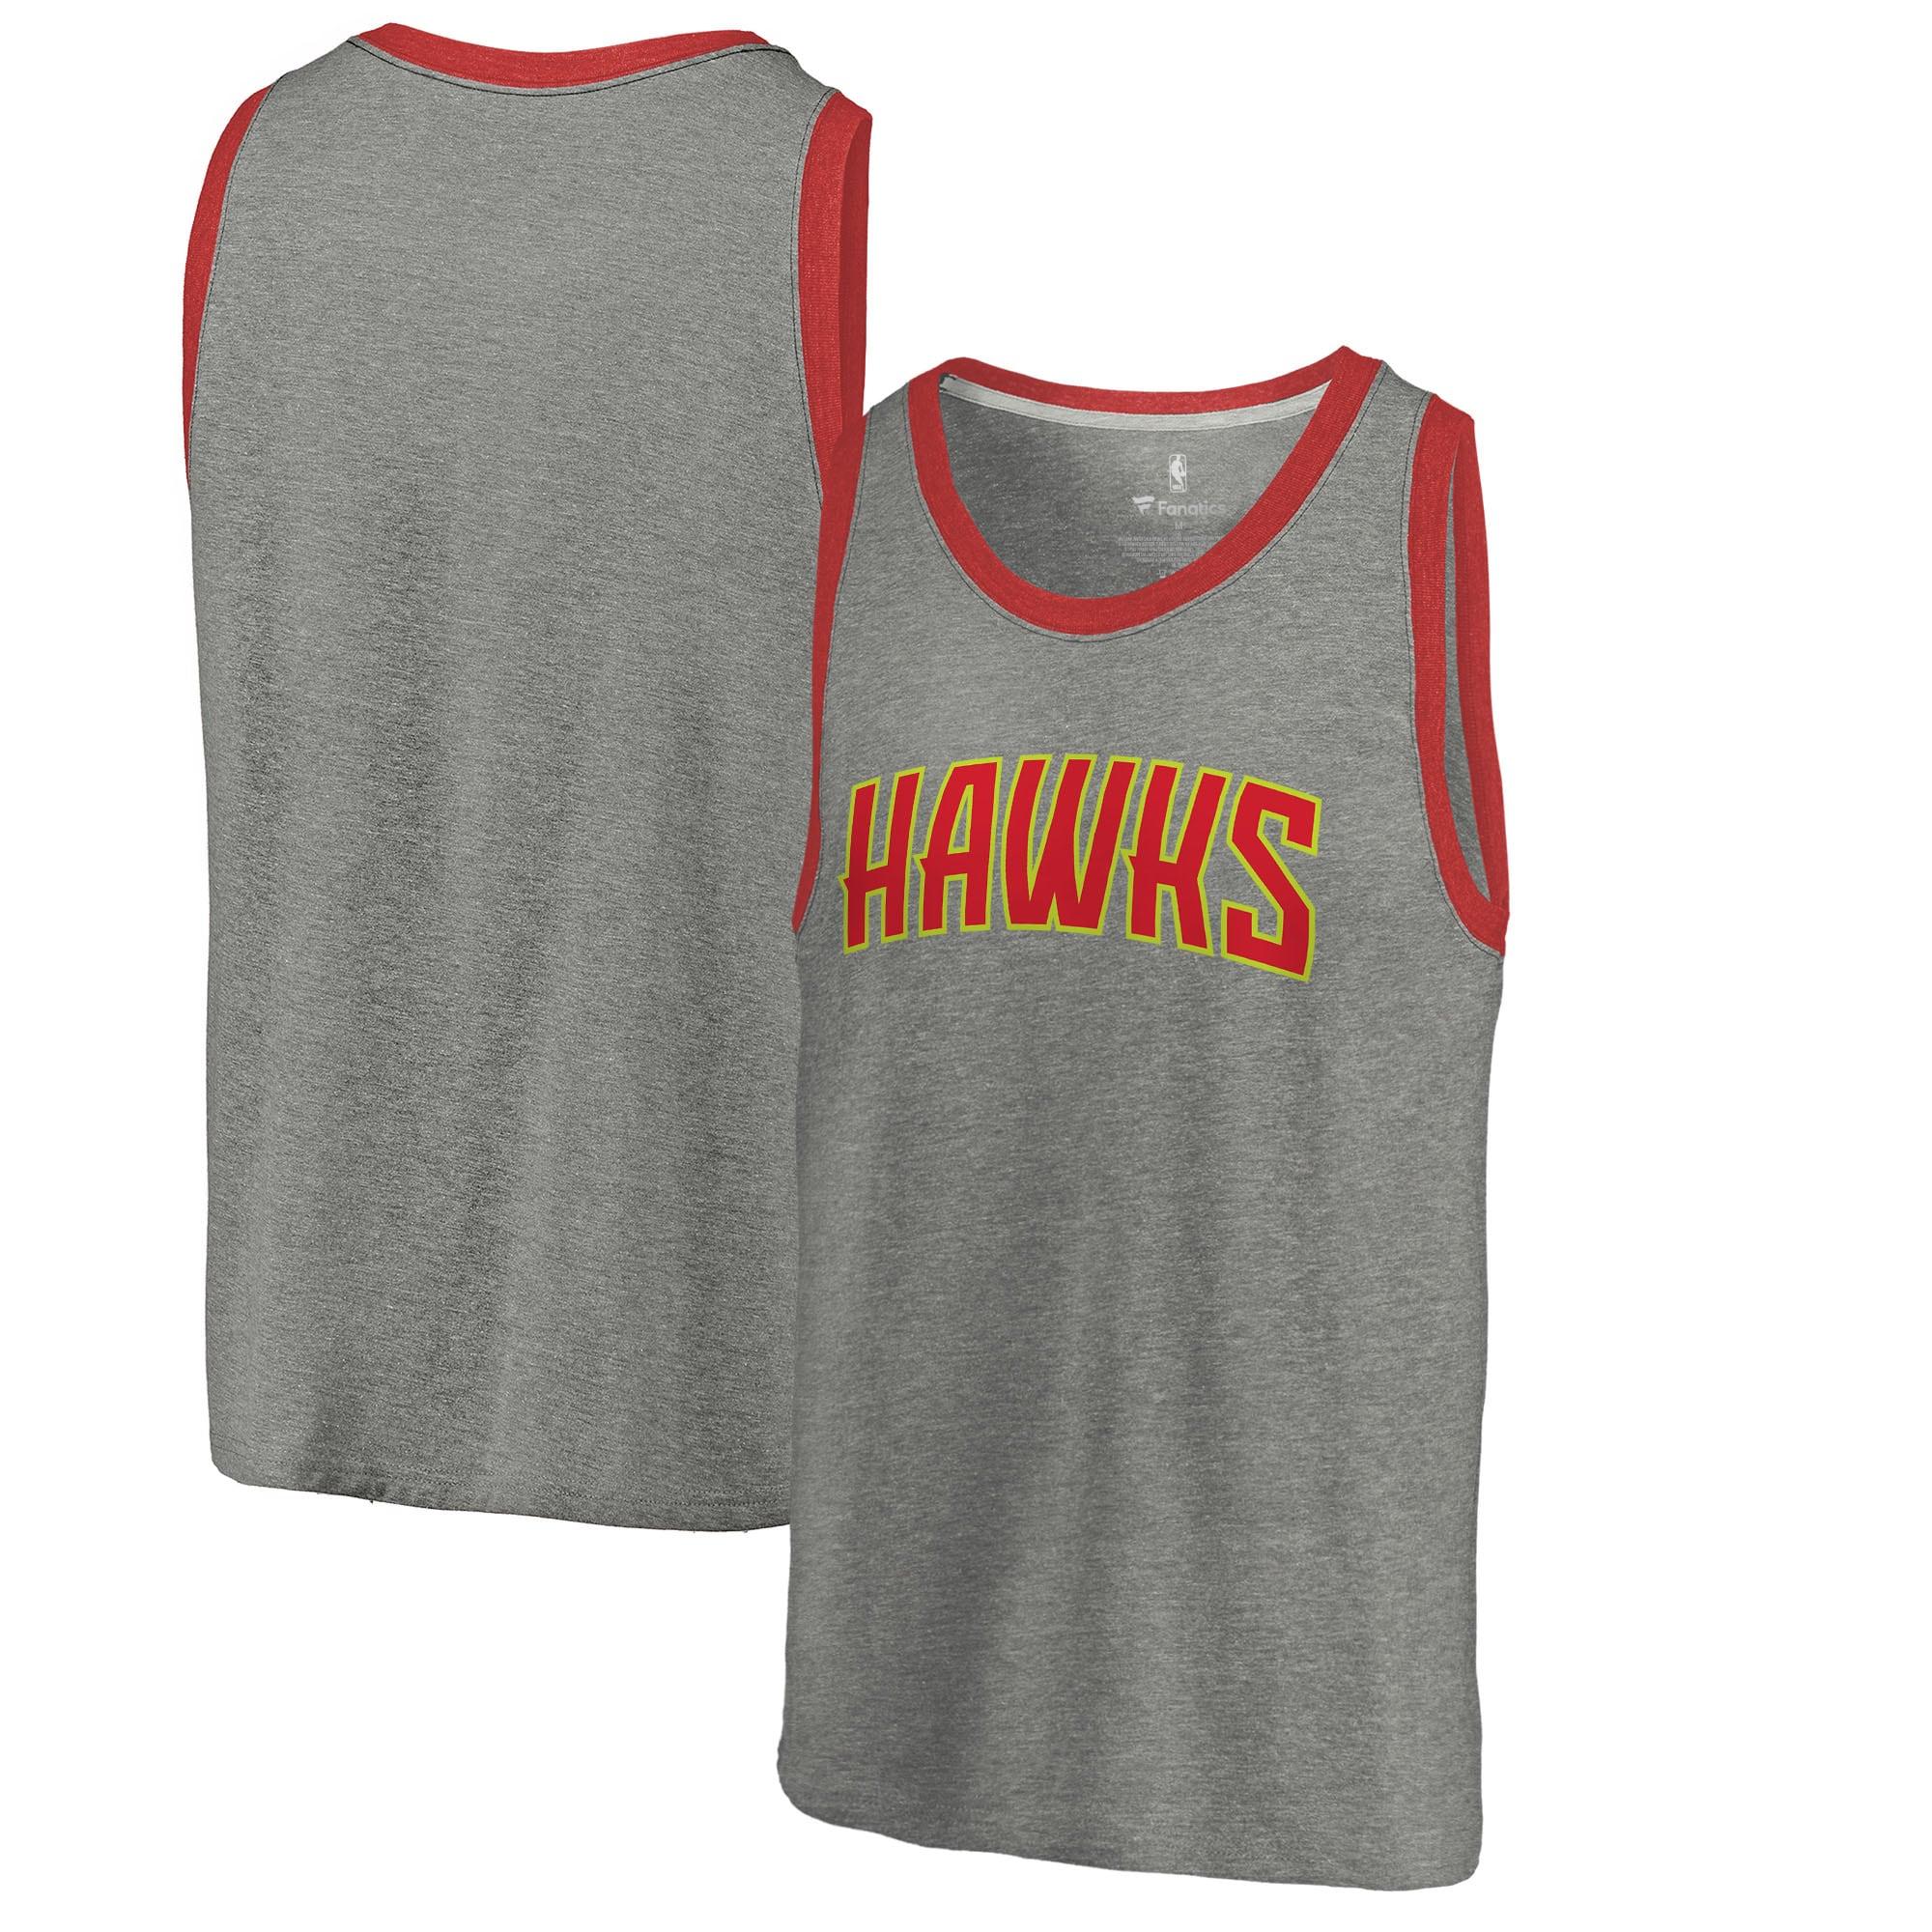 Atlanta Hawks Fanatics Branded Wordmark Tri-Blend Tank Top - Heathered Gray